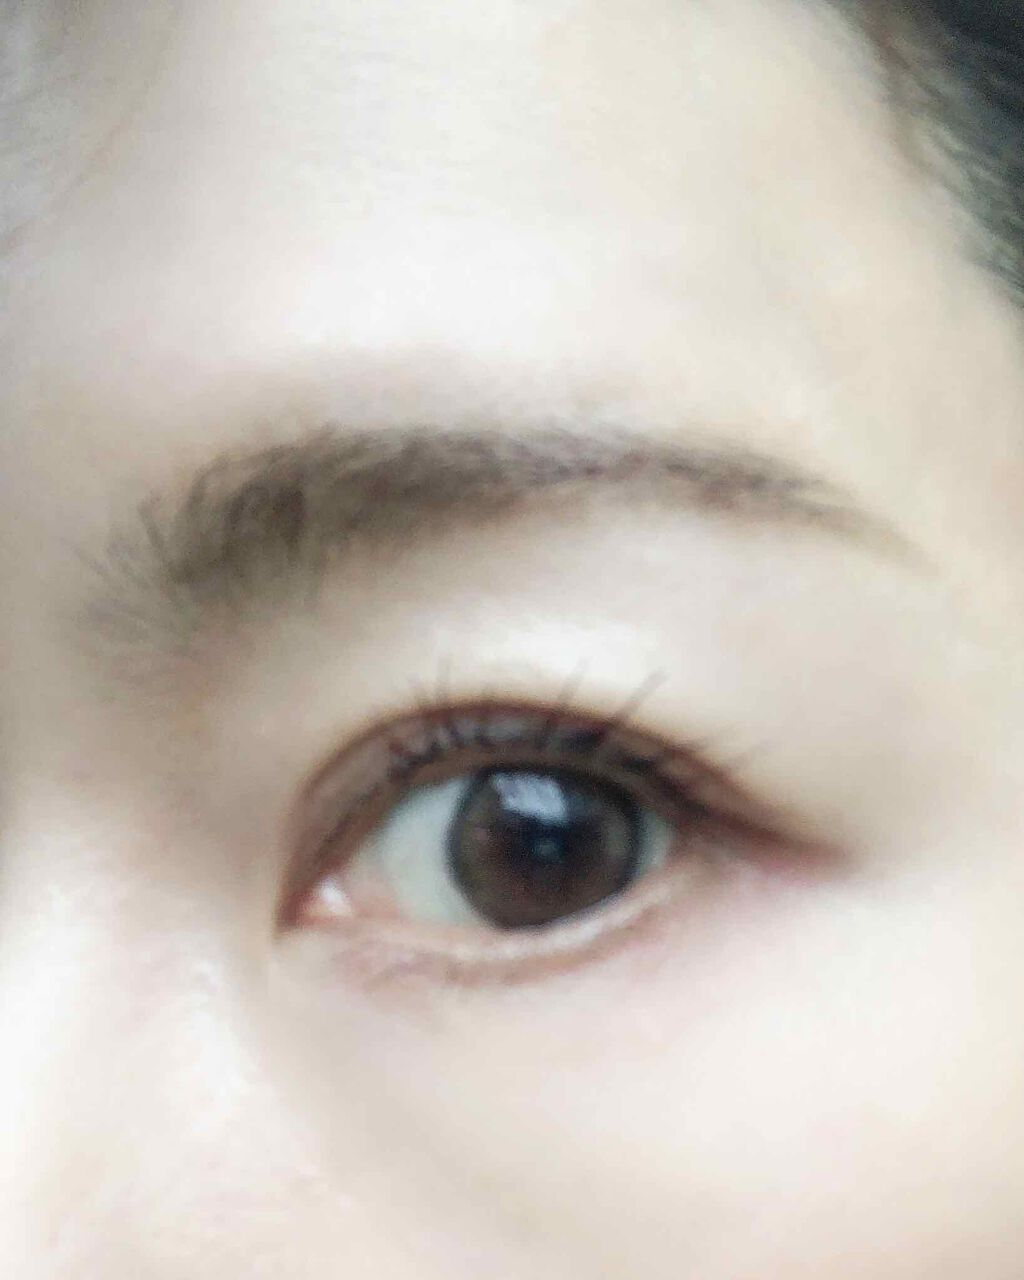 https://cdn.lipscosme.com/image/128f620fcb4639be8895816b-1595058583-thumb.png